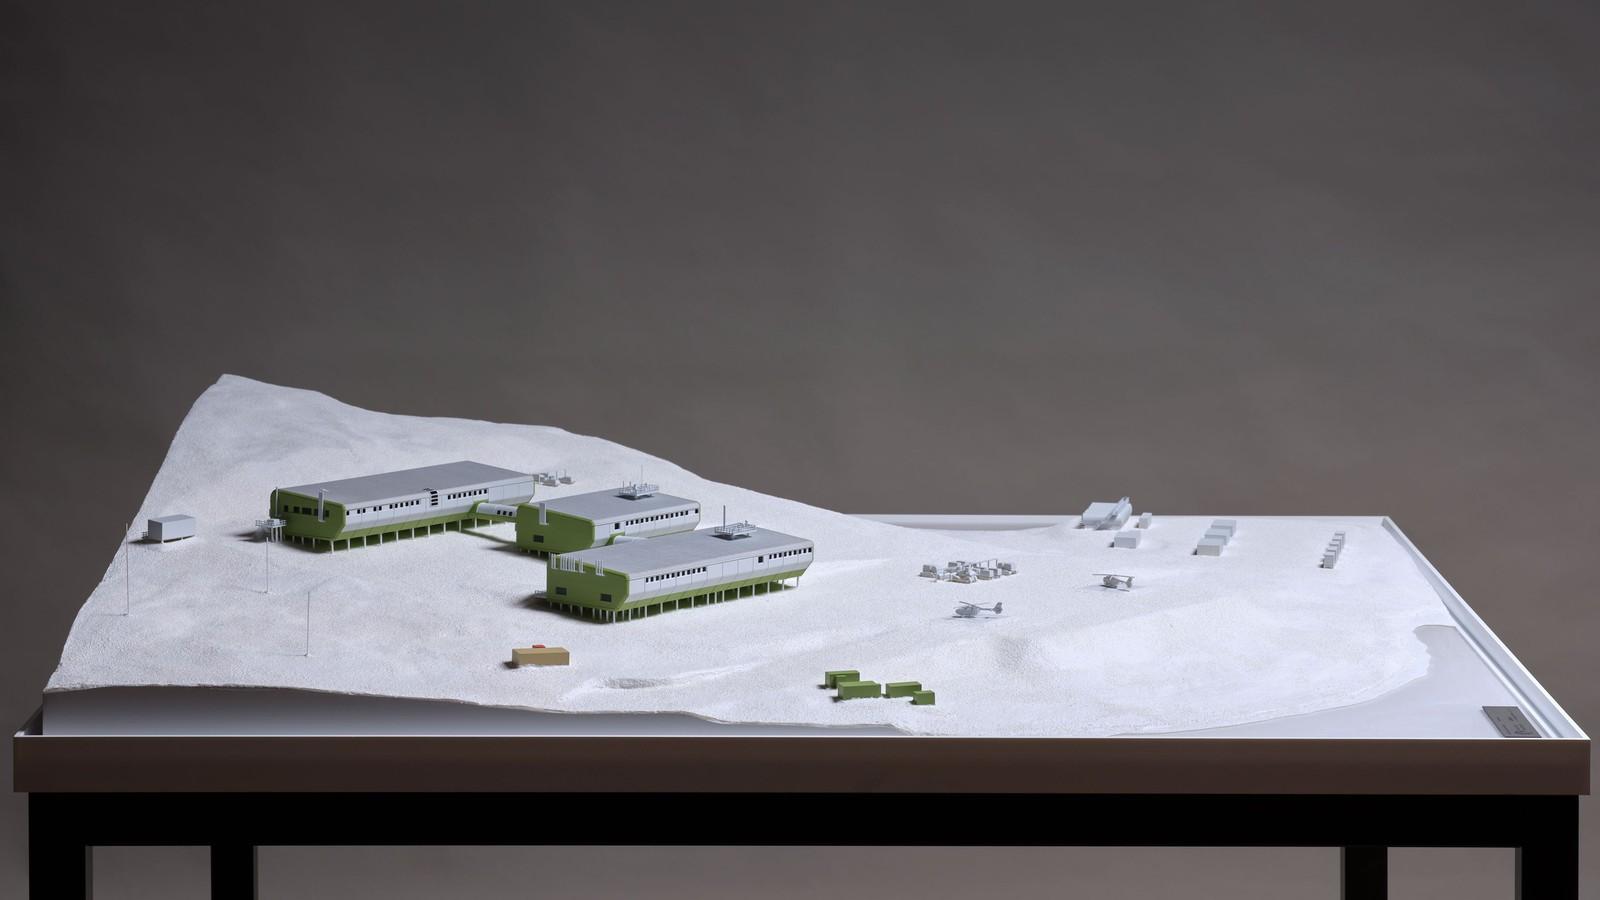 Scott Base Redevelopment 9